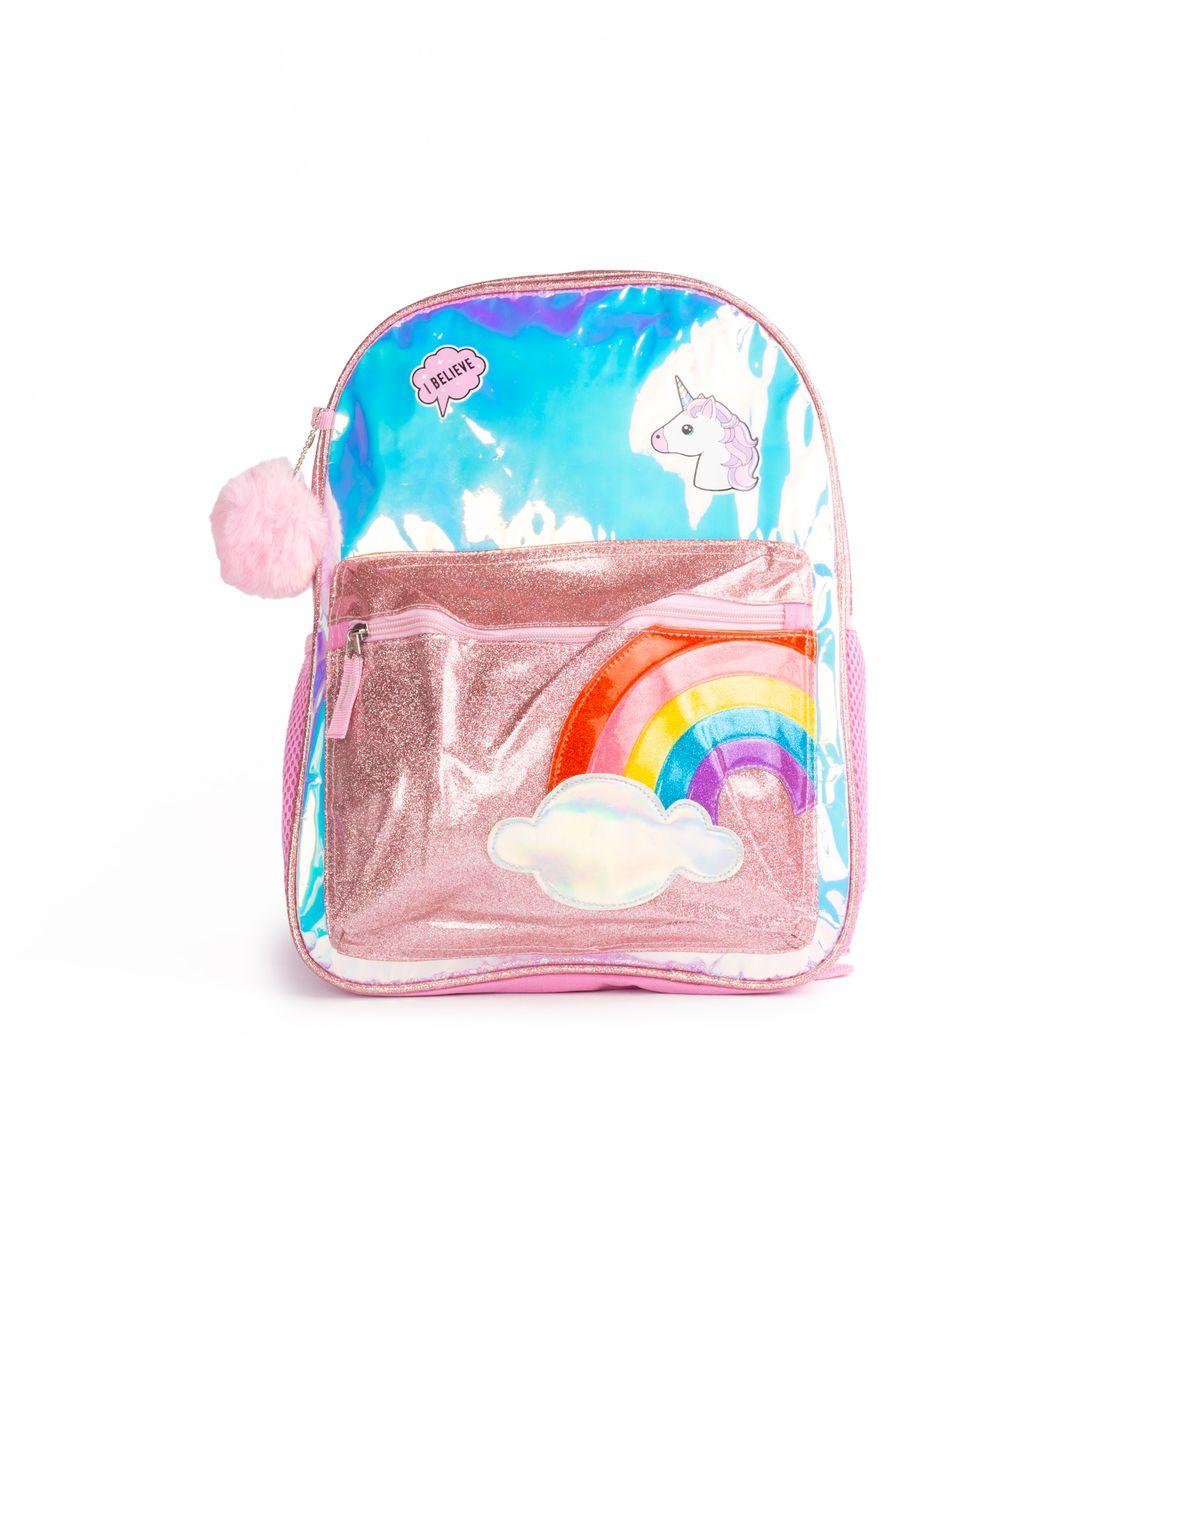 509359002-mochila-infantil-menina-holografica-arco-iris-glitter-rosa-u-f9f